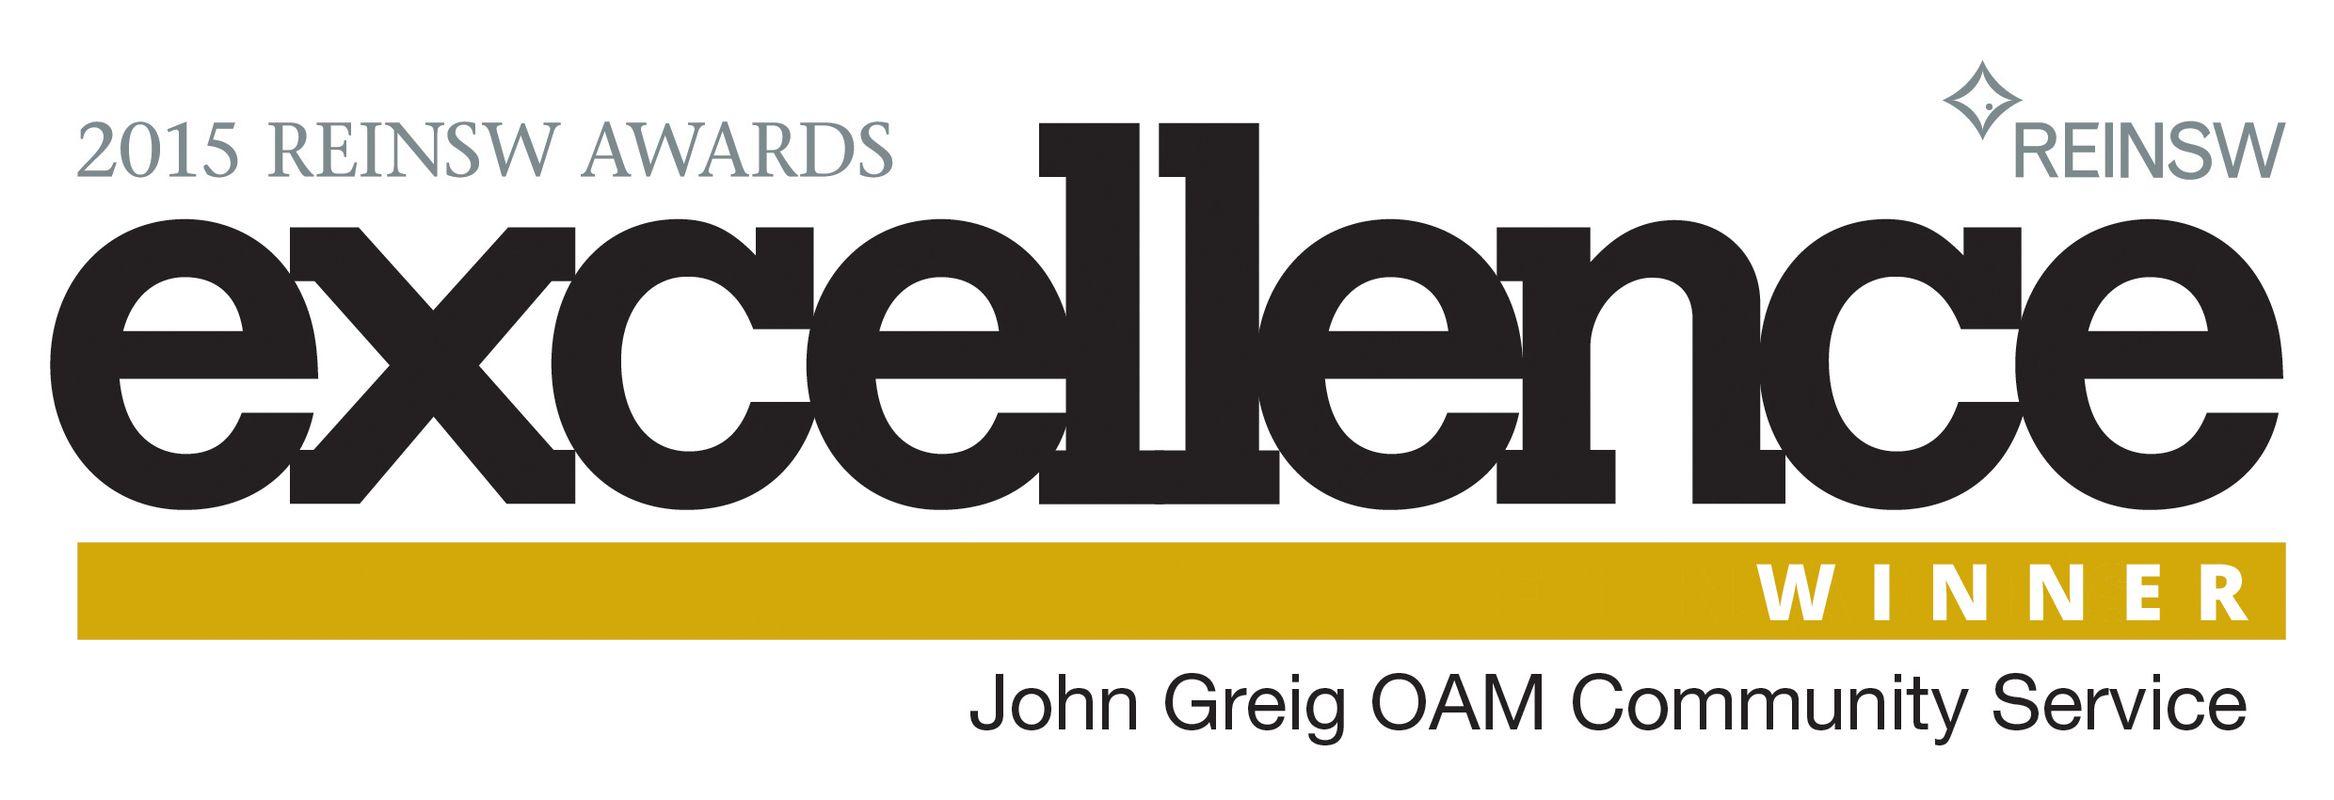 John Greig Award